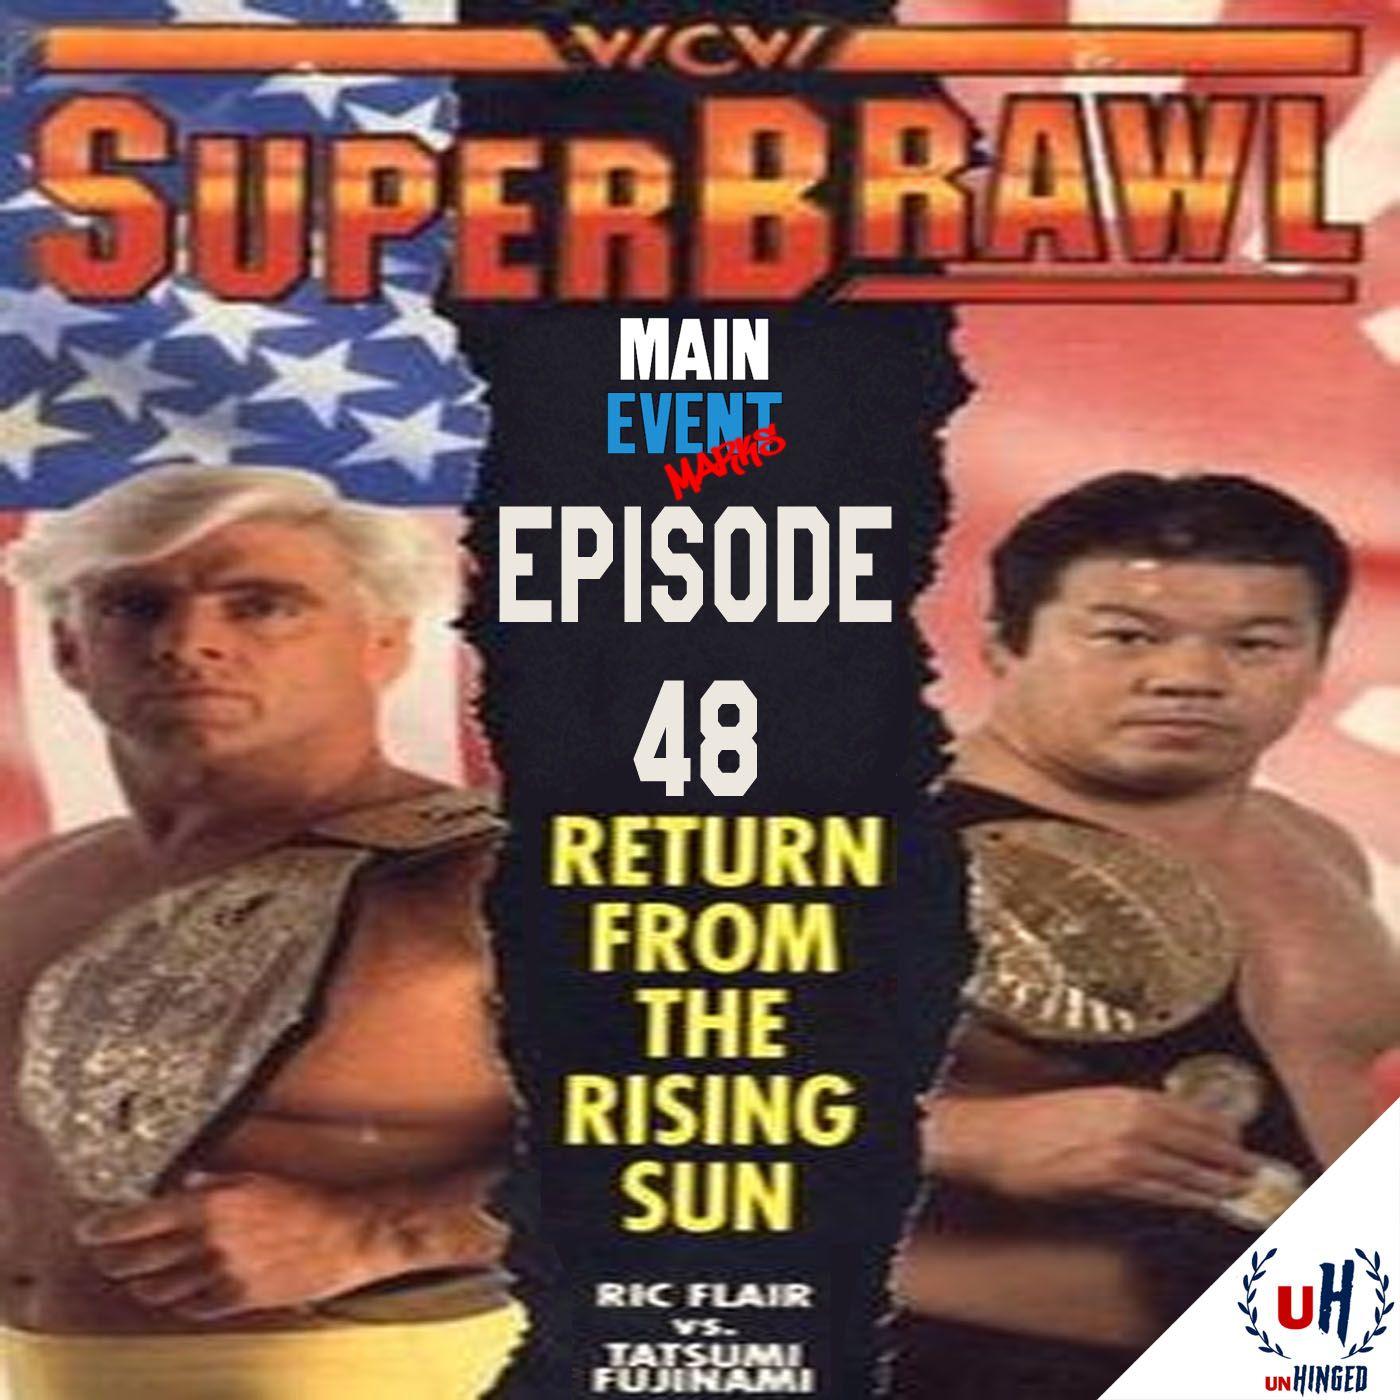 Episode 48: WCW SuperBrawl I (Return from the Rising Sun)